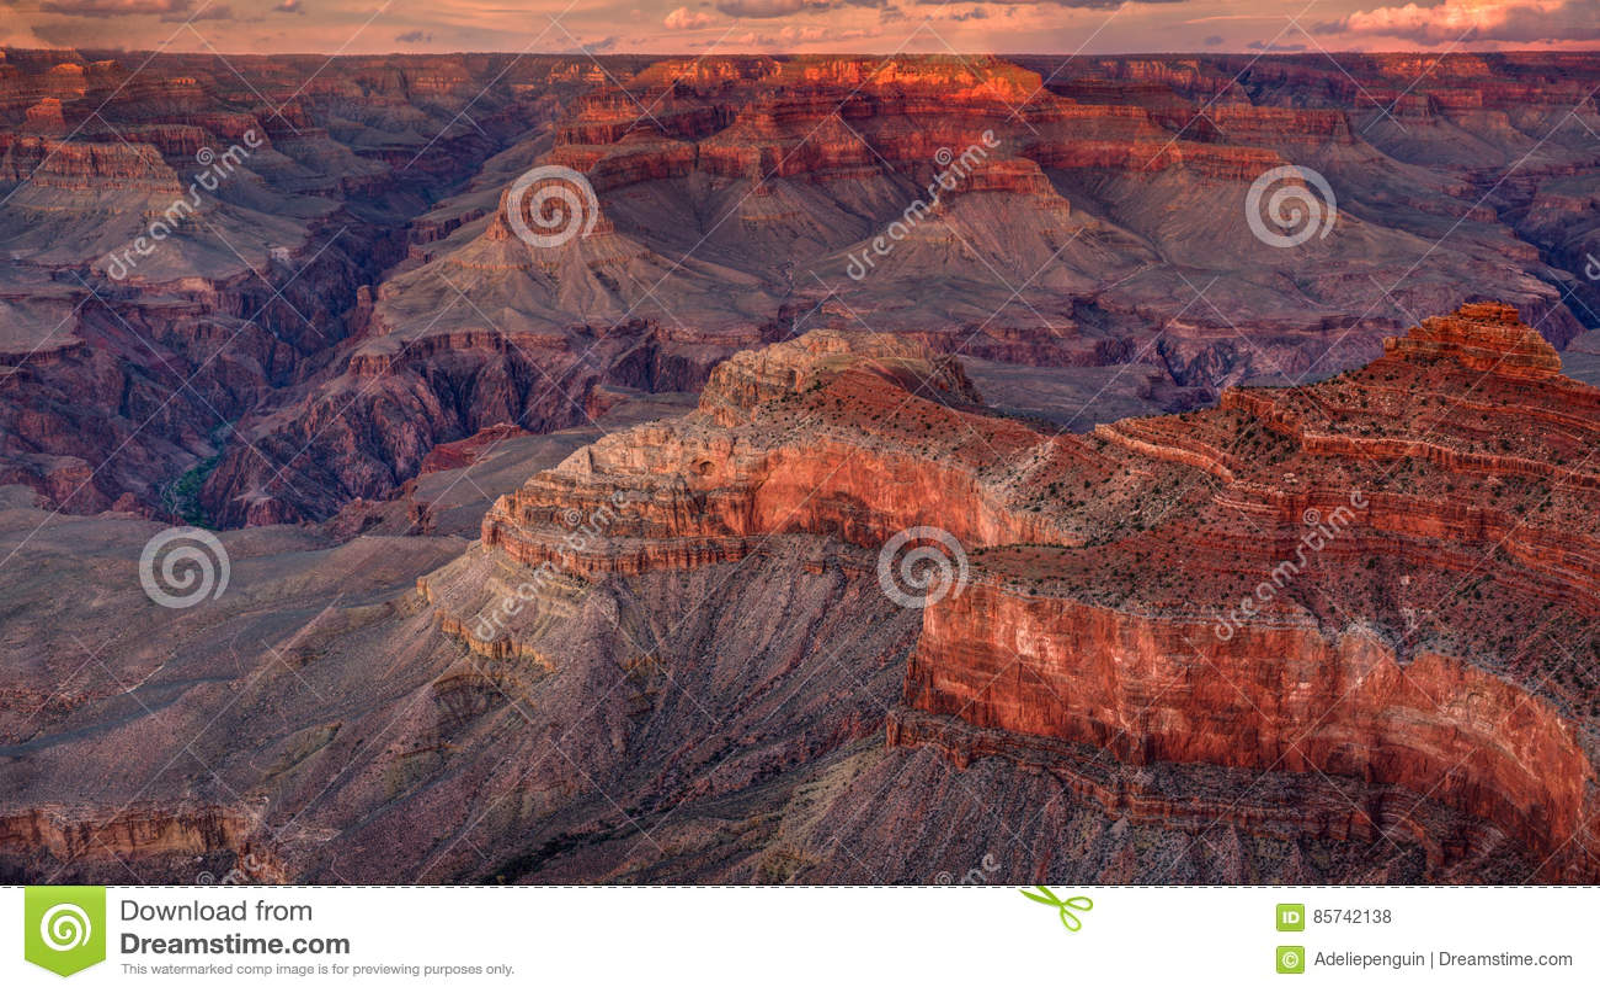 Grand Canyon National Park, Sunset, Arizona